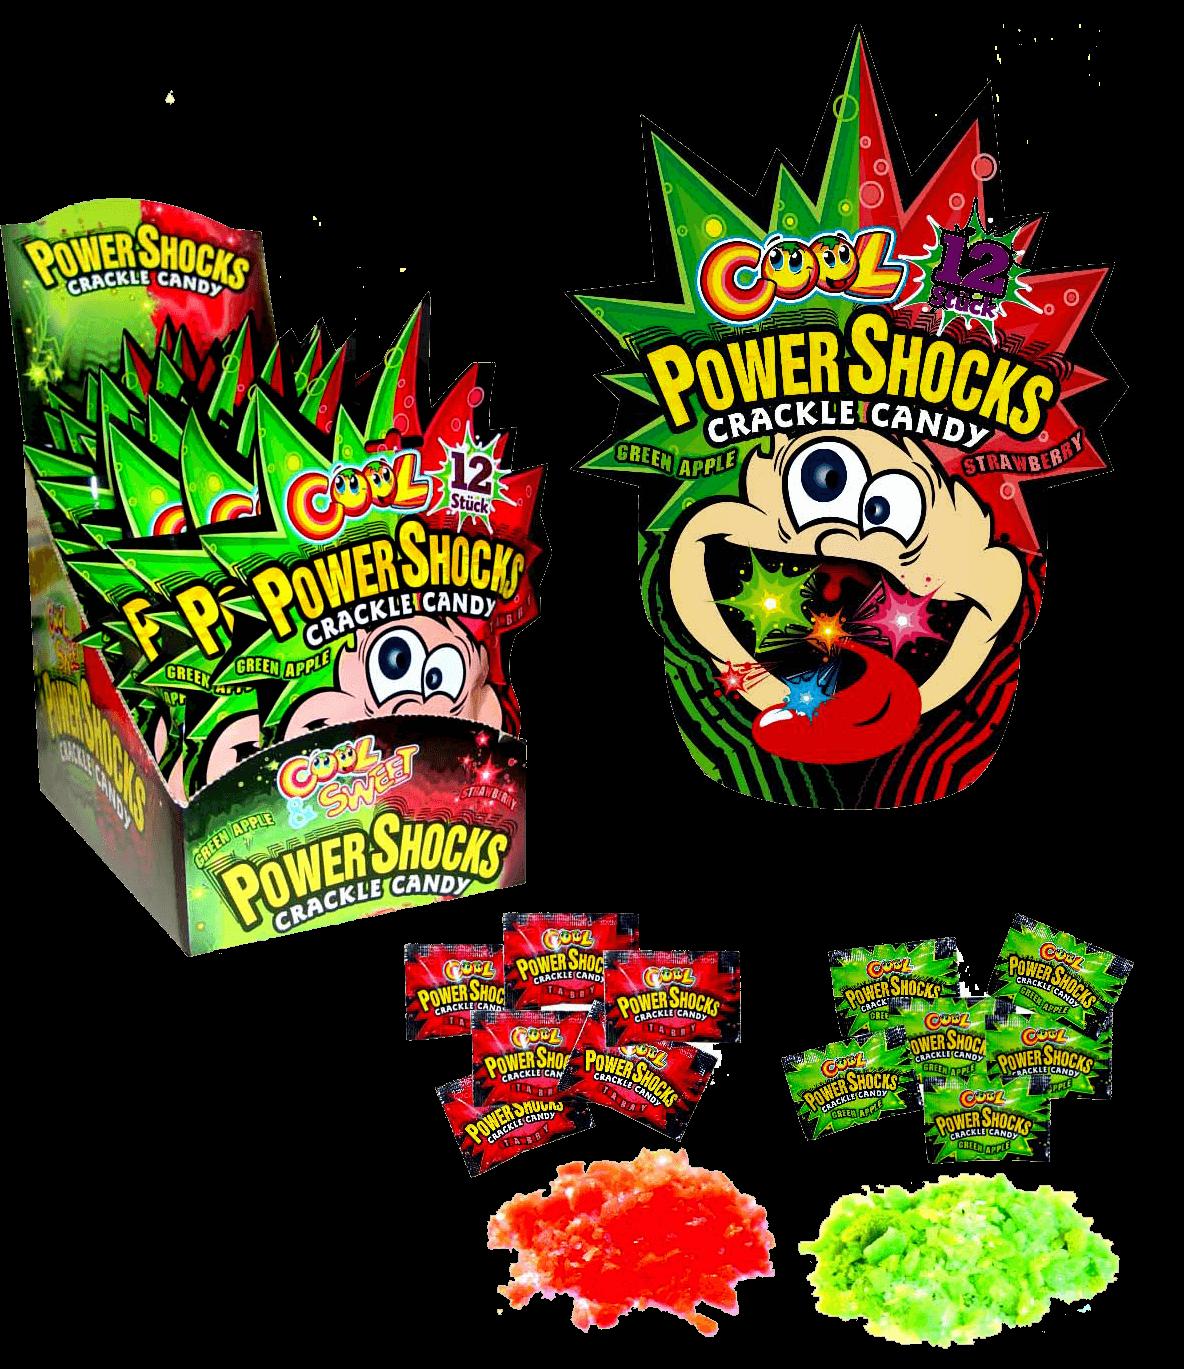 Power shocks